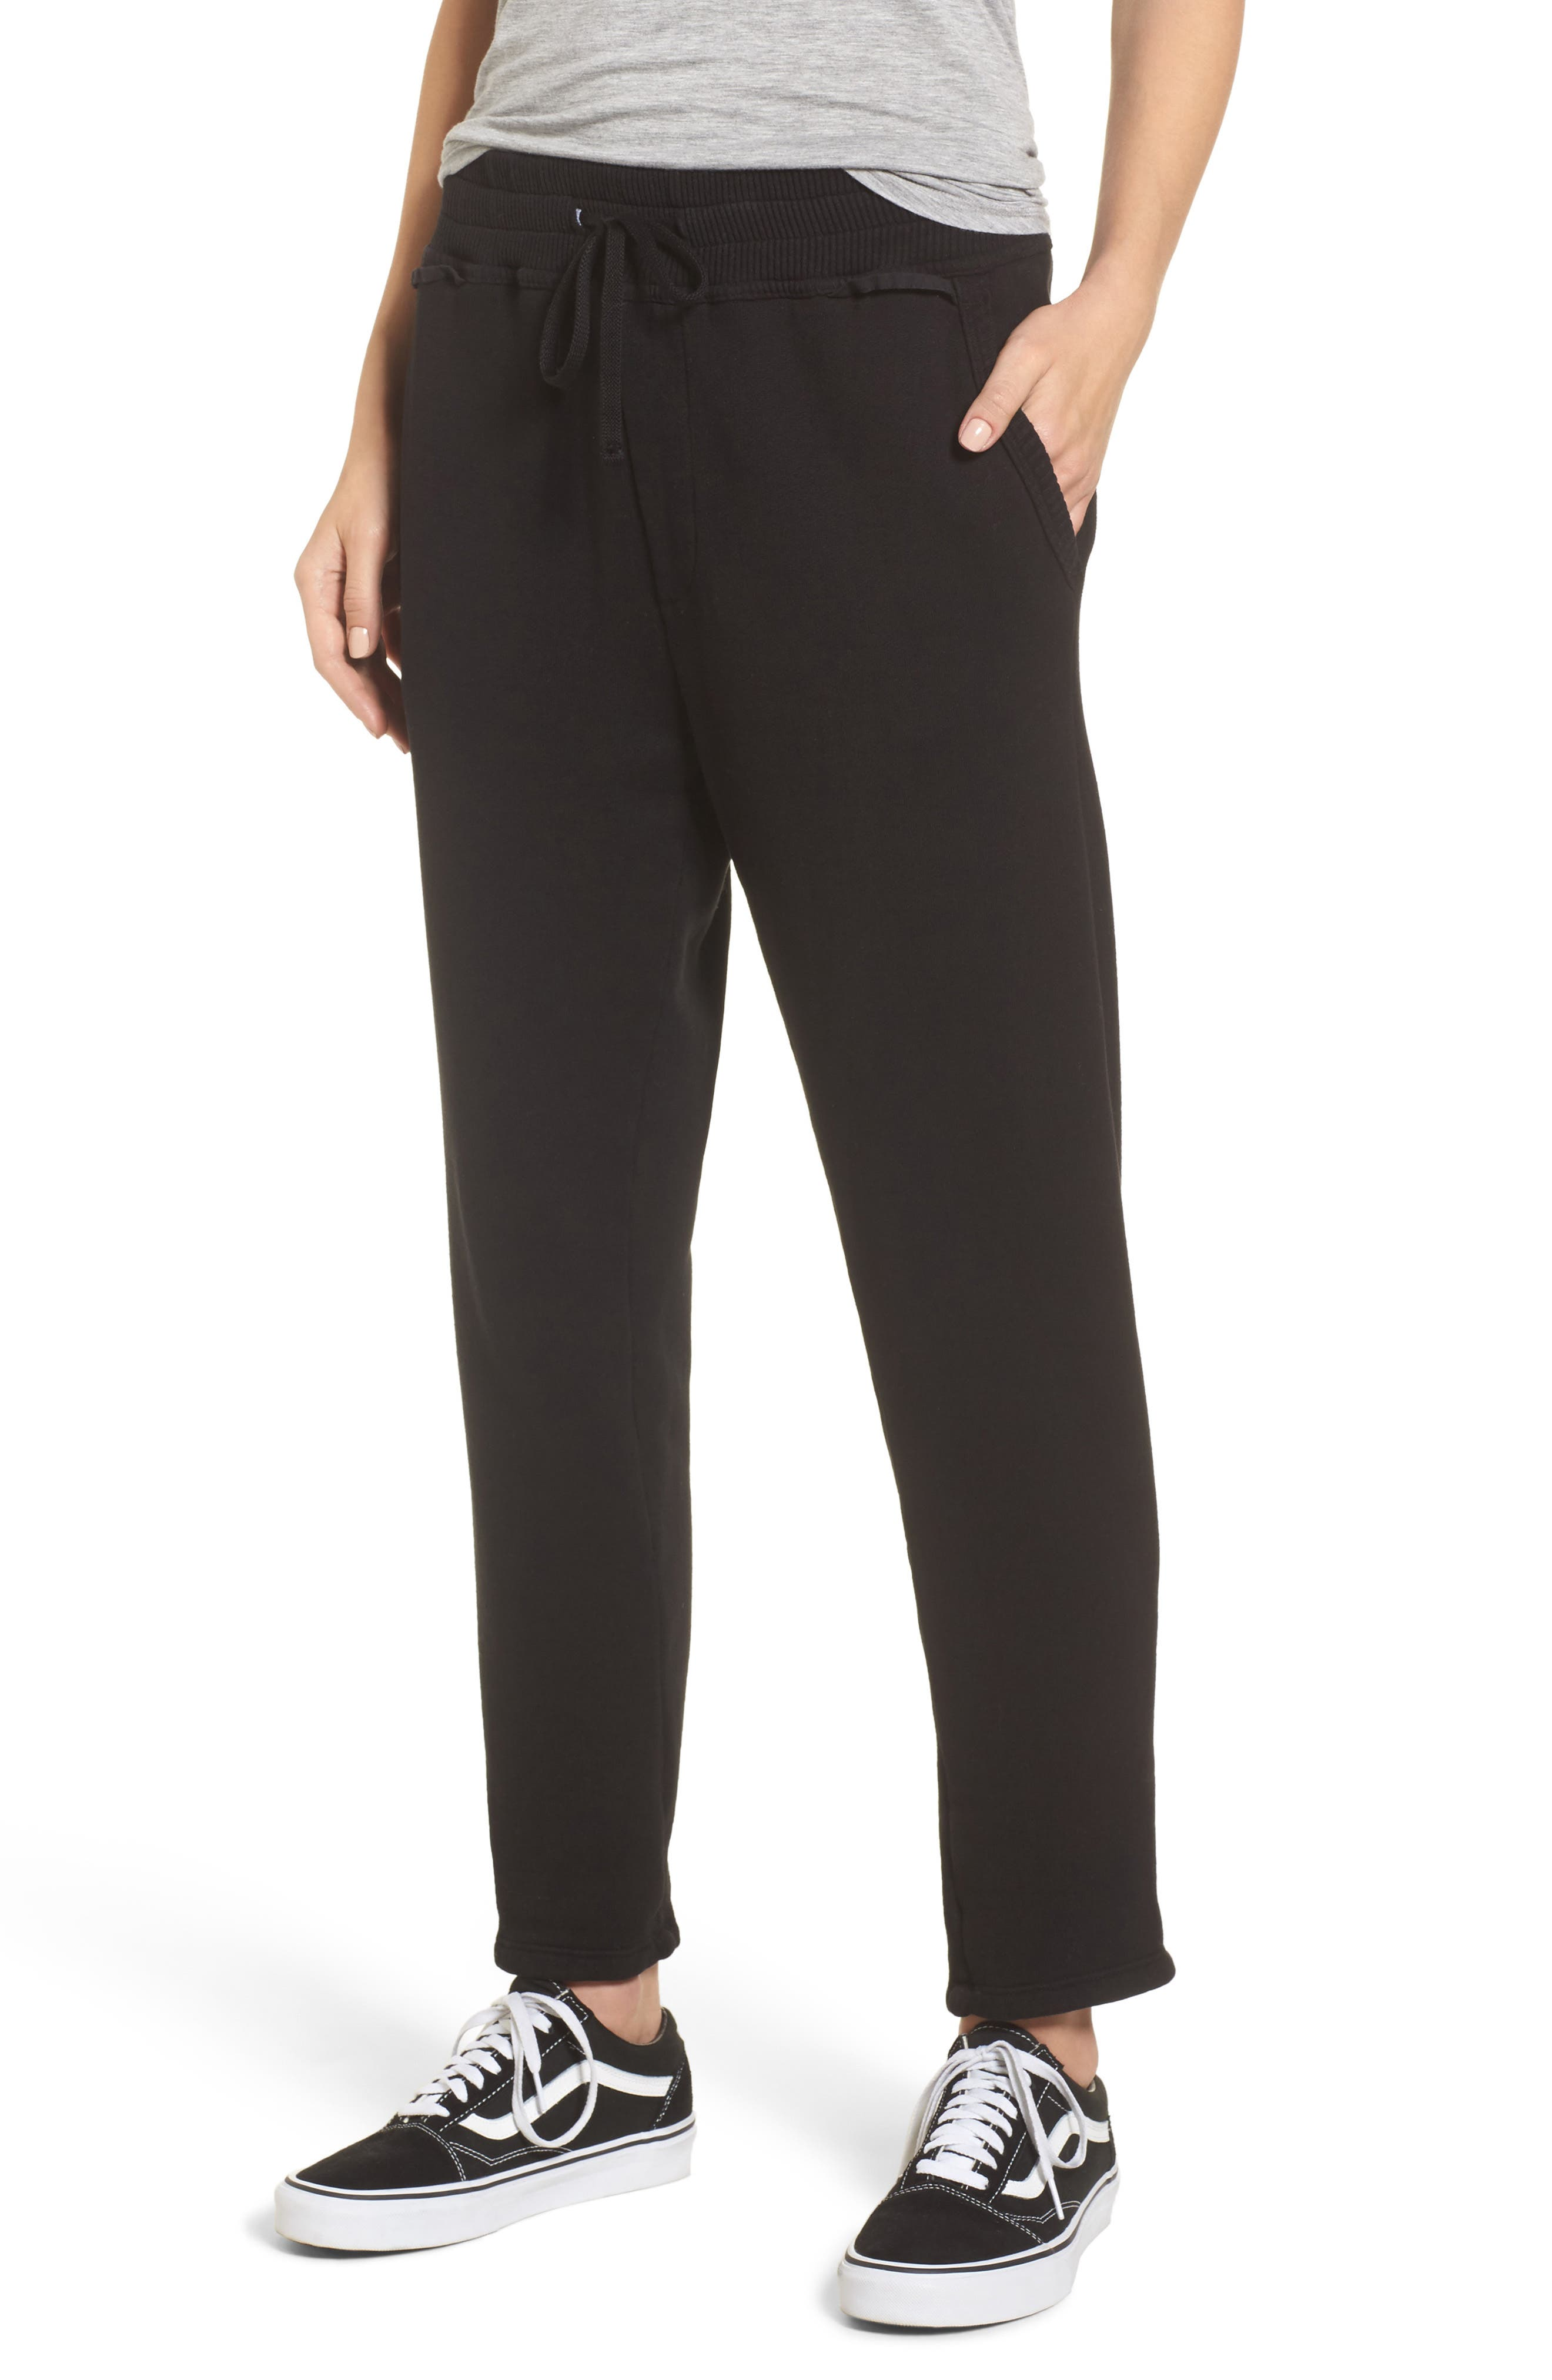 Terry Lounge Pants,                             Main thumbnail 1, color,                             Black